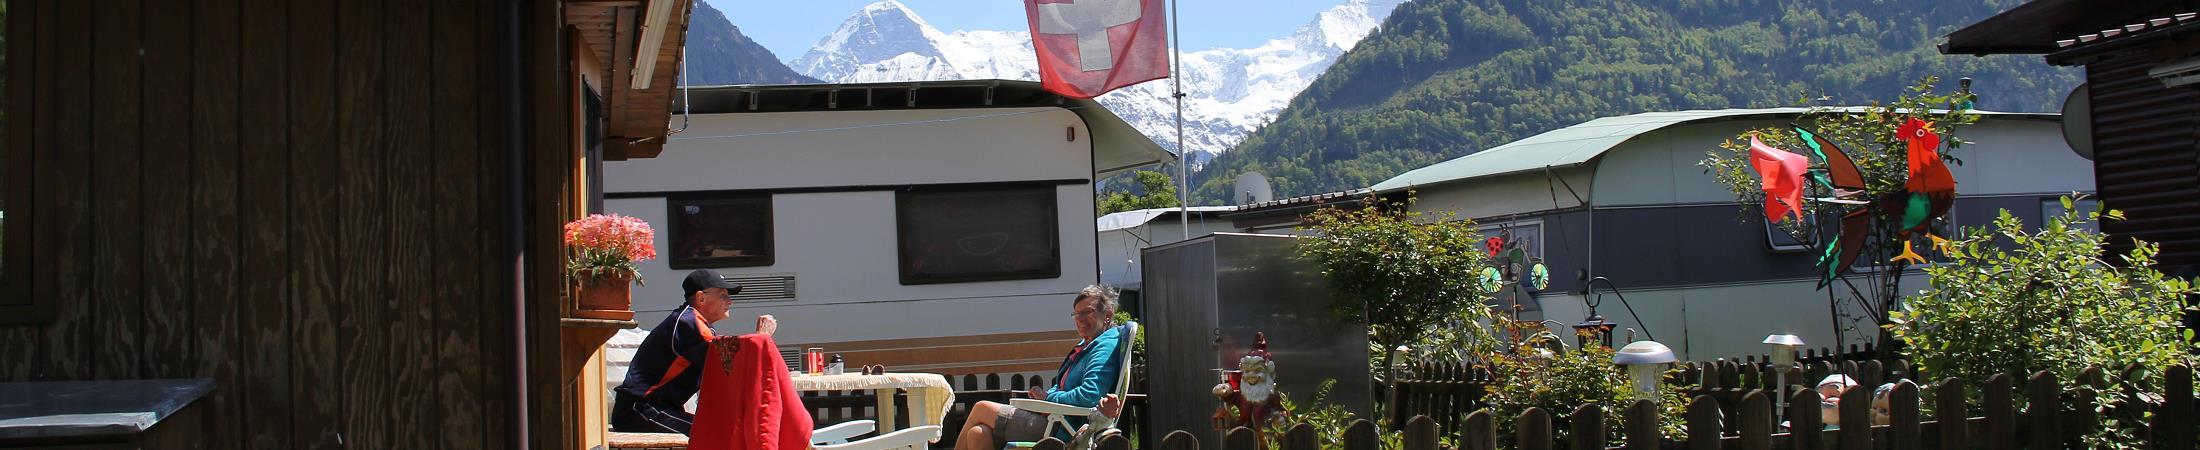 Residenzplätze Camping Lazy Rancho Unterseen Interlaken Berner Oberland Jungfrauregion